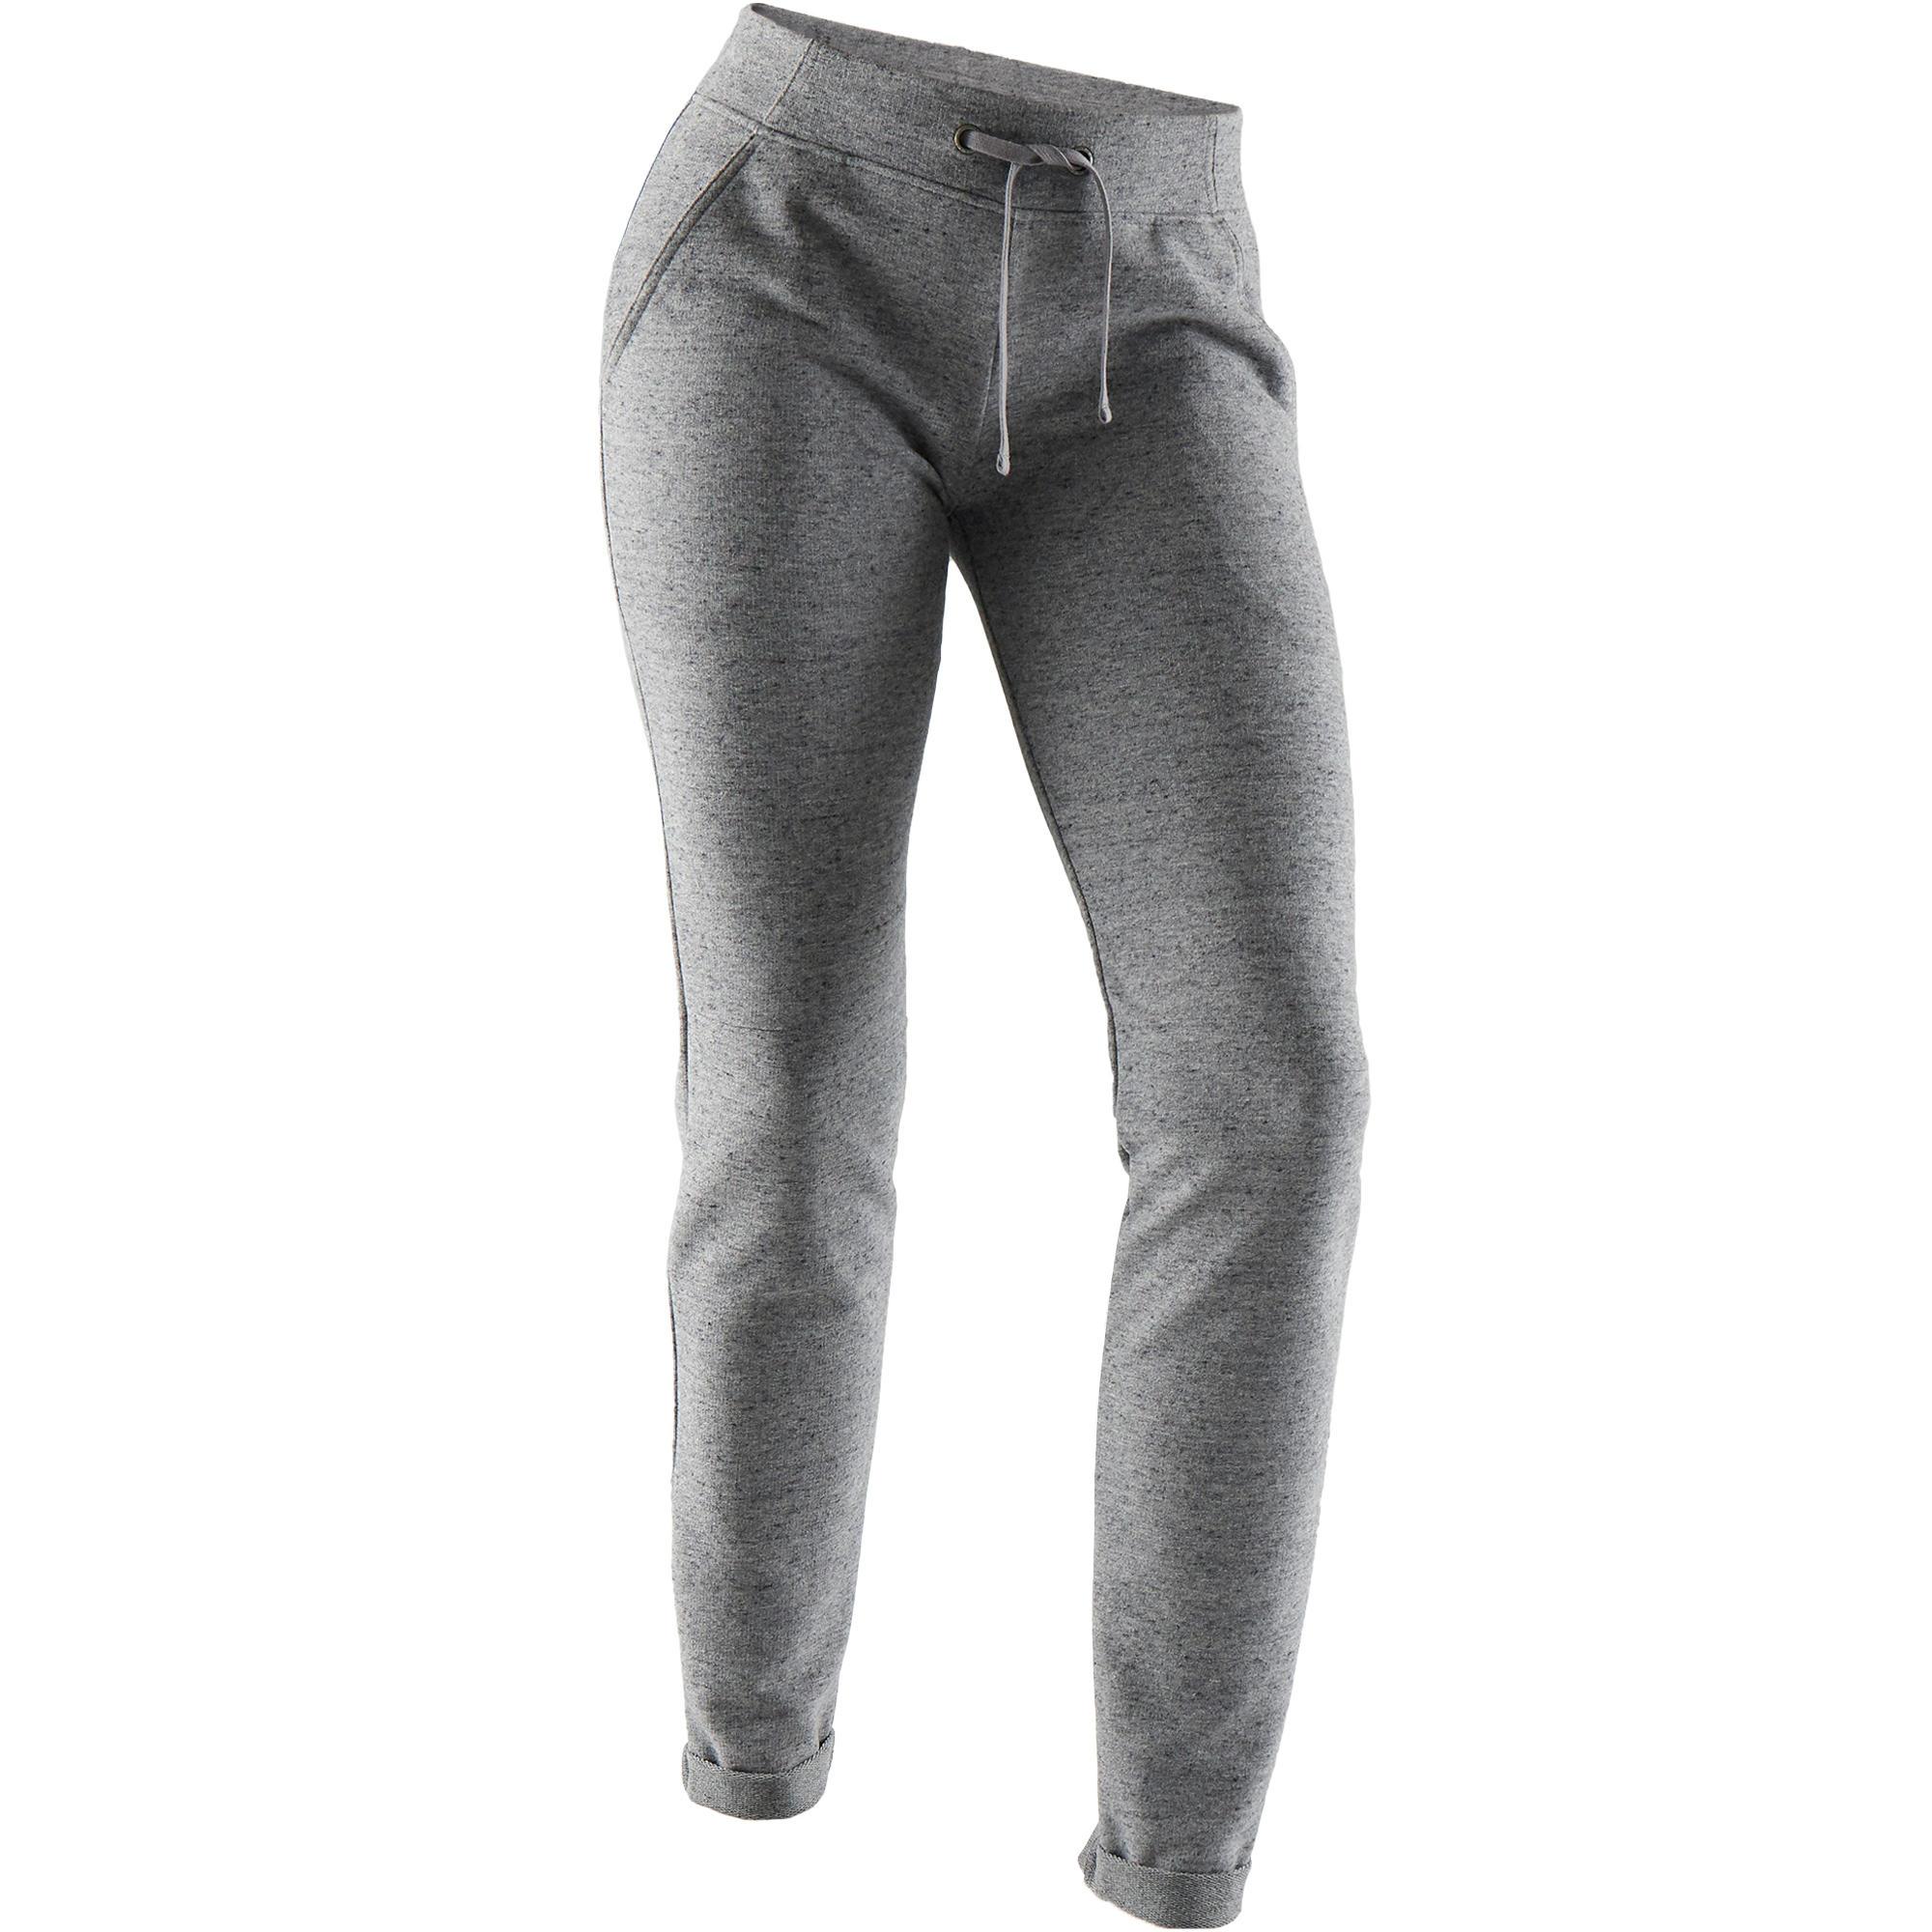 Jogginghose 500 Slim Pilates sanfte Gymnastik Damen grau | Sportbekleidung > Sporthosen > Jogginghosen | Grau | Domyos